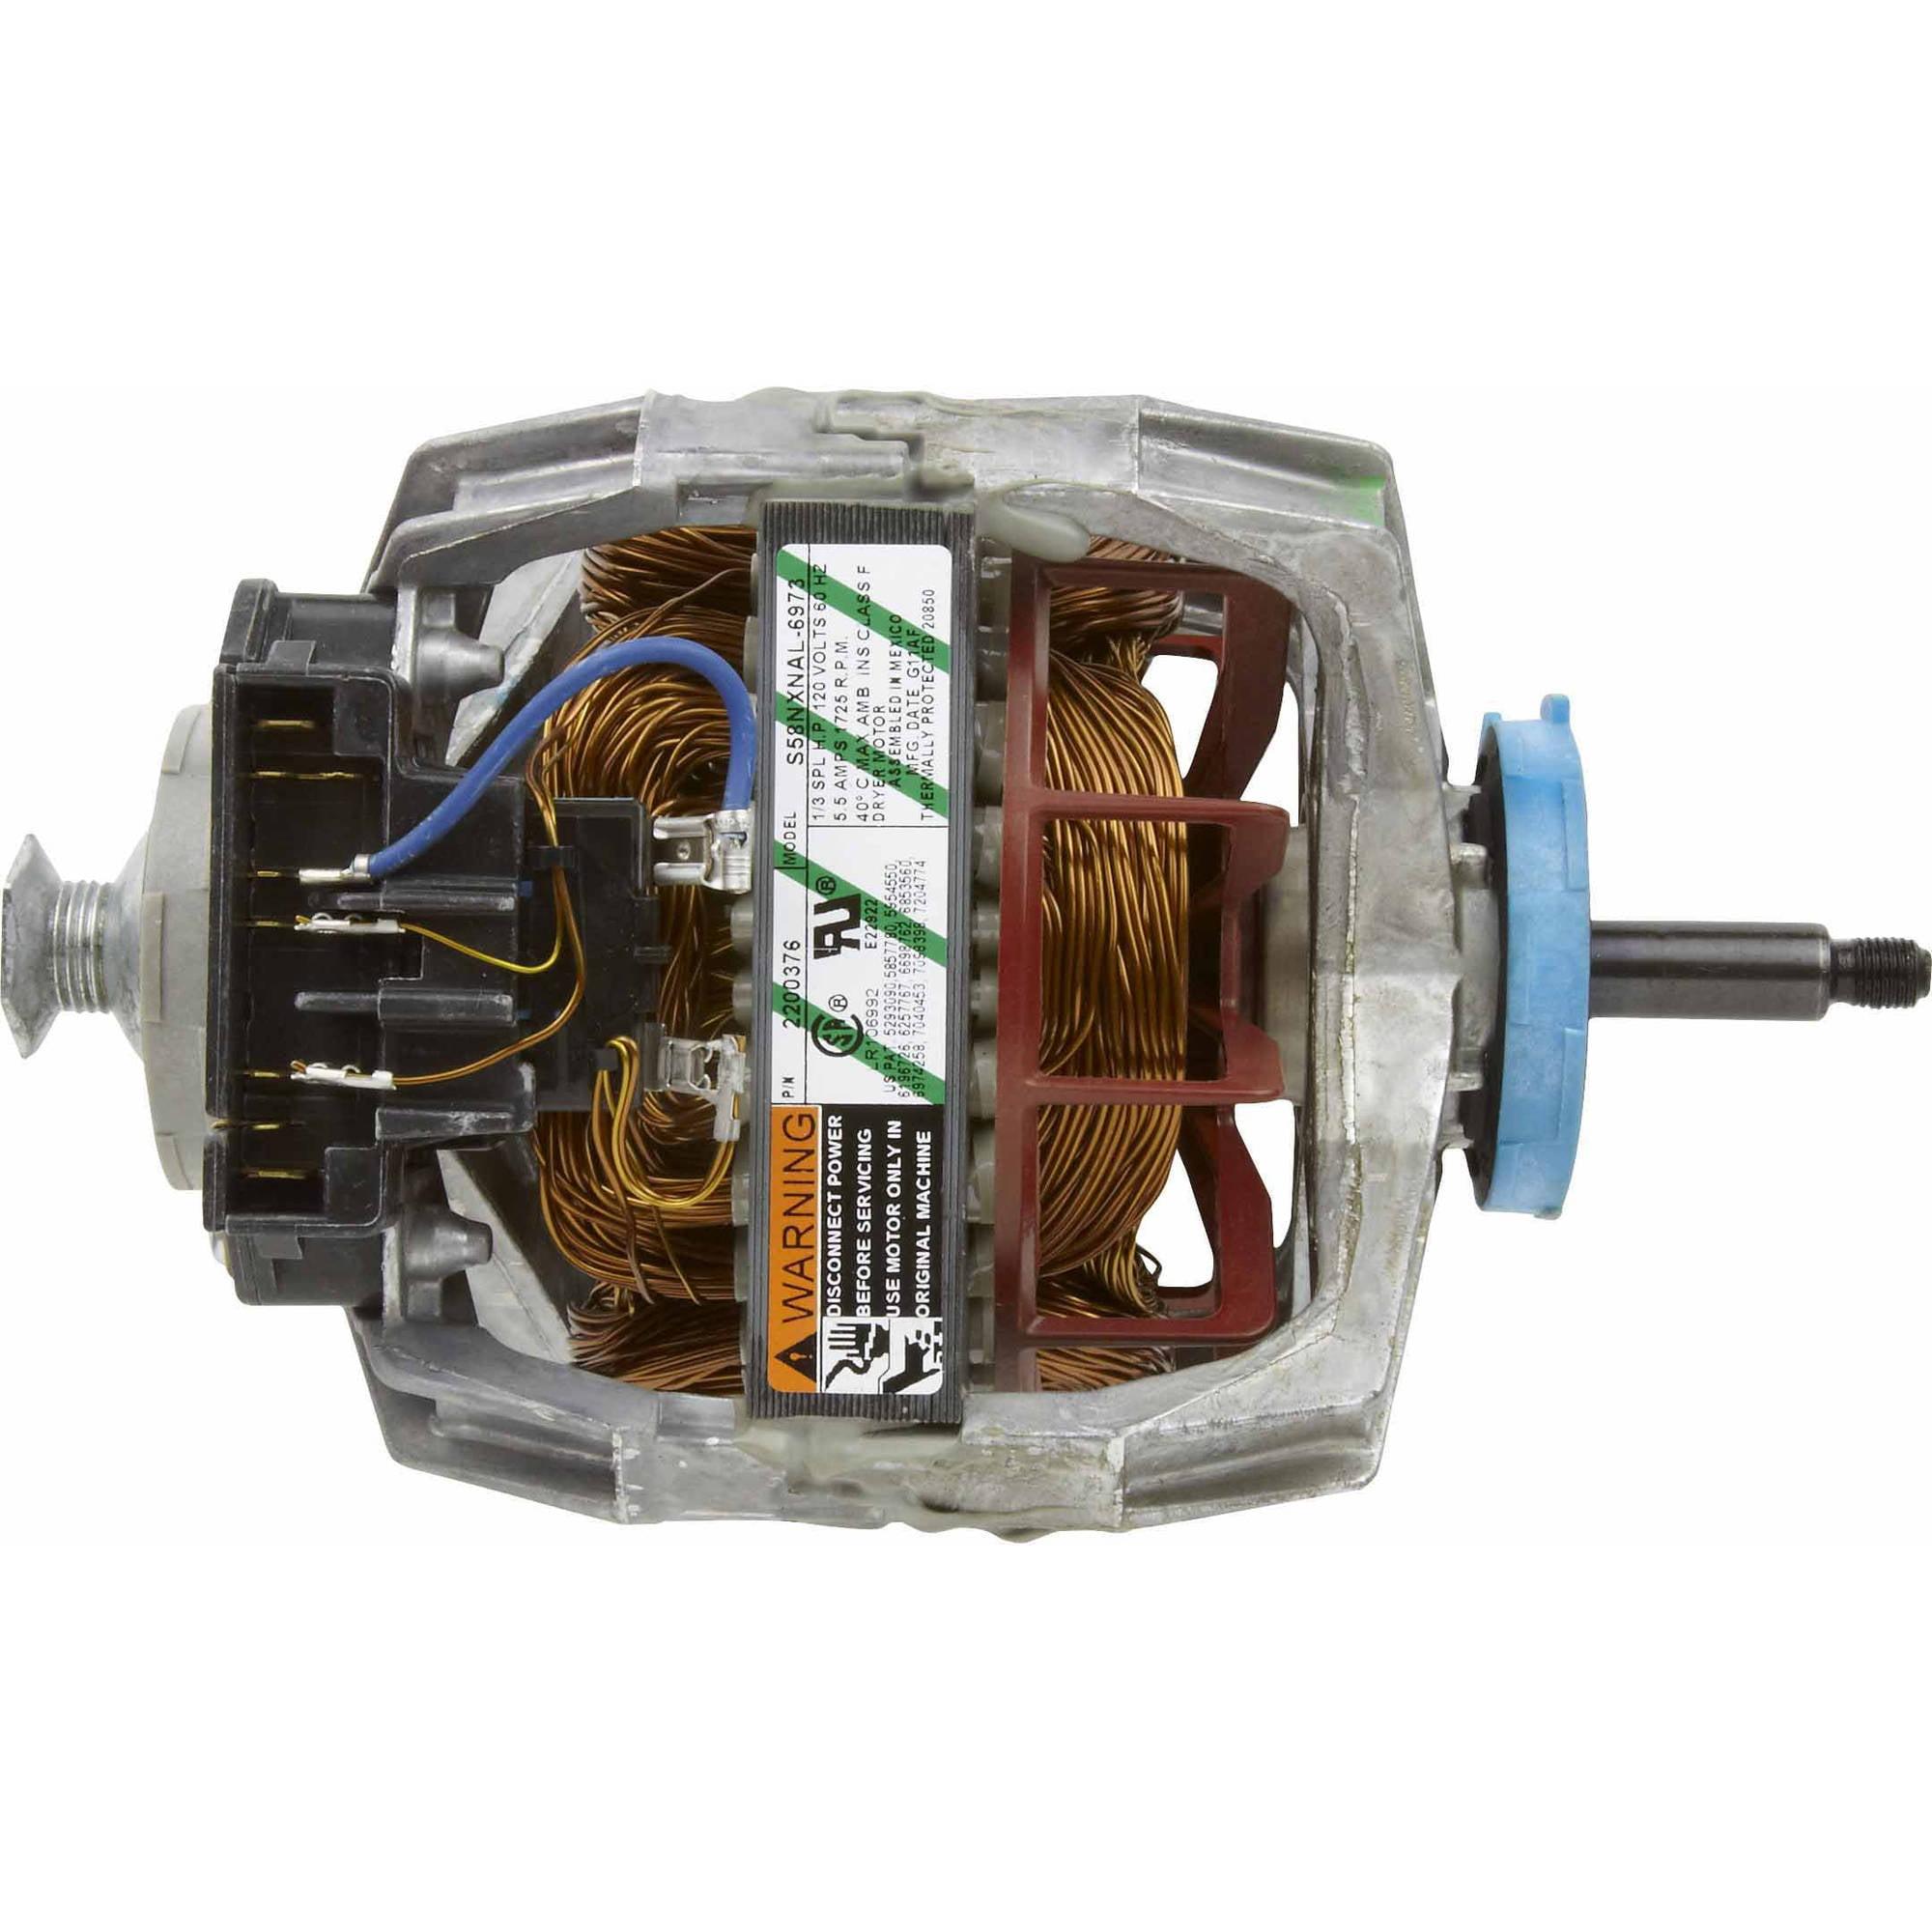 Whirlpool 2200376 Drive Motor